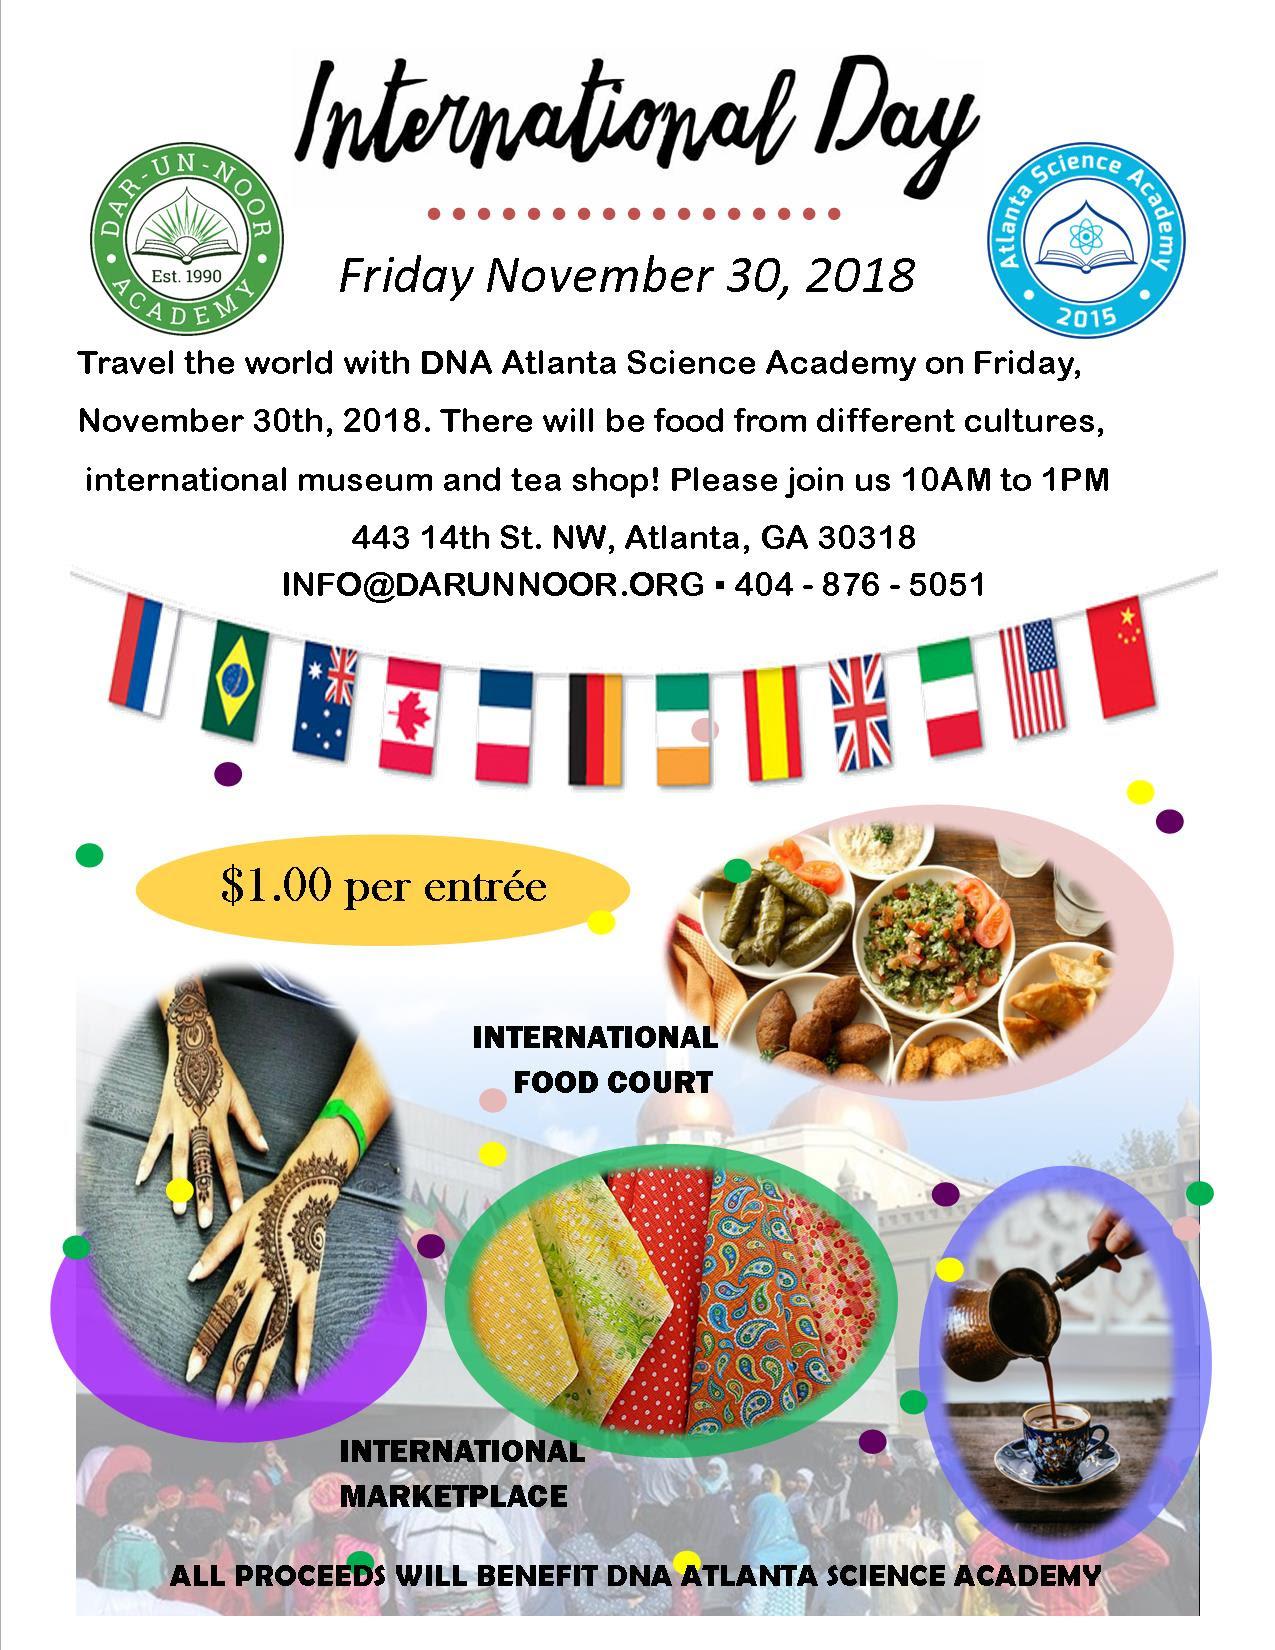 INTERNATIONAL DAY on NOVEMBER 30th